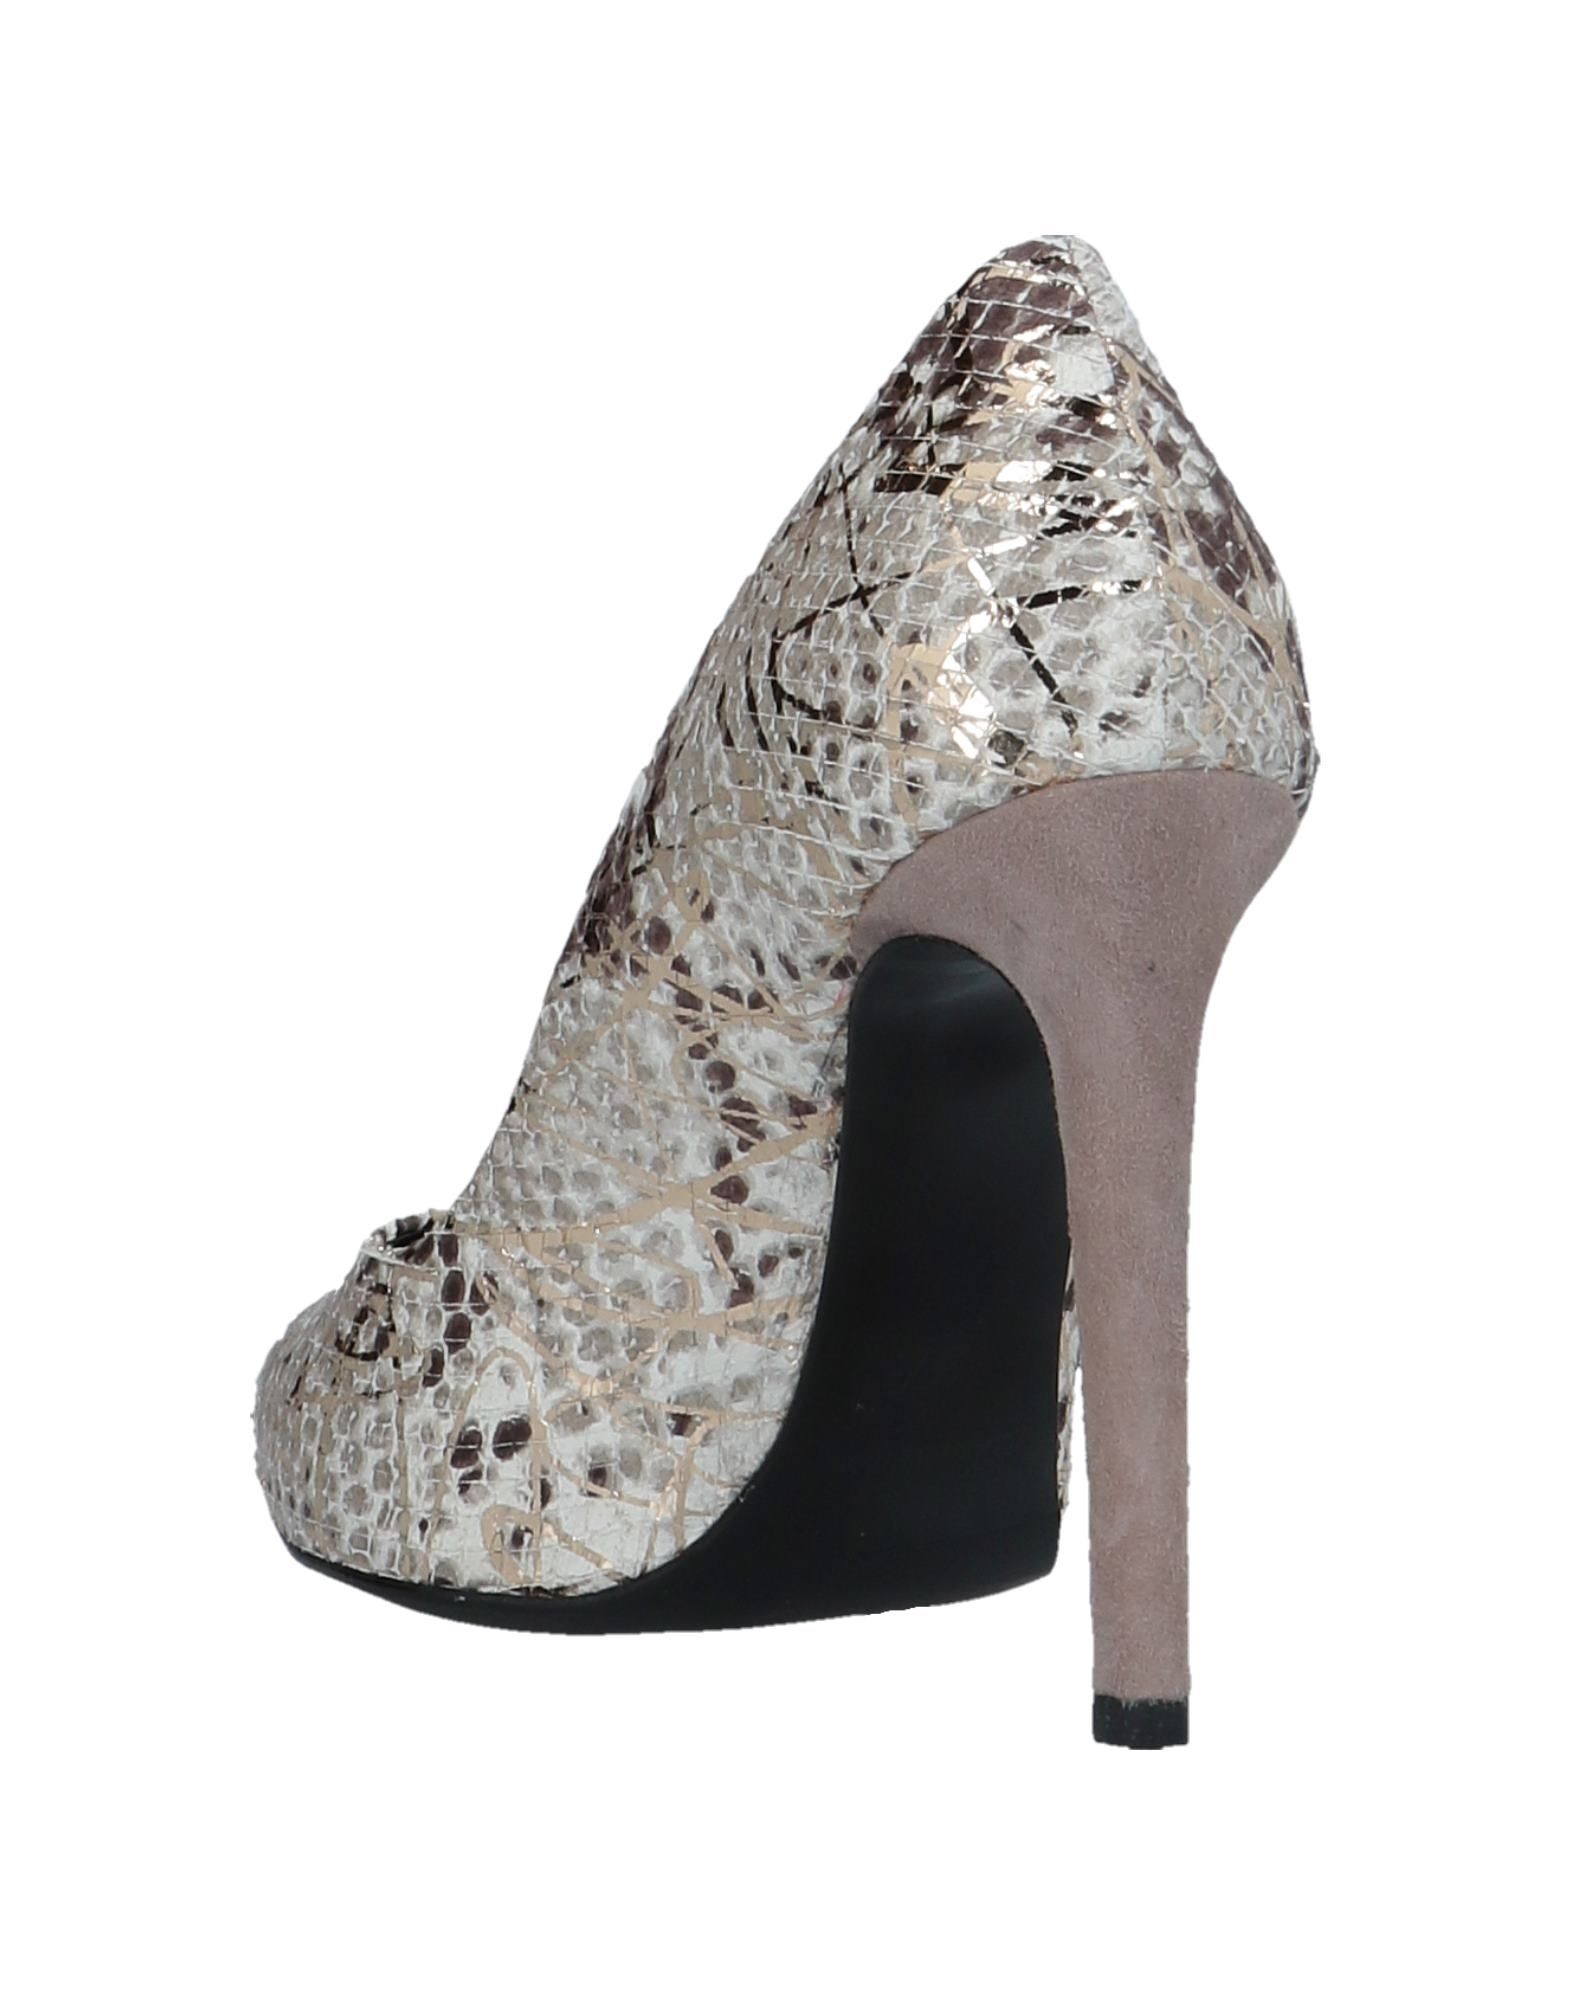 Stilvolle Pumps billige Schuhe Gianni Marra Pumps Stilvolle Damen  11543413QR 86f900